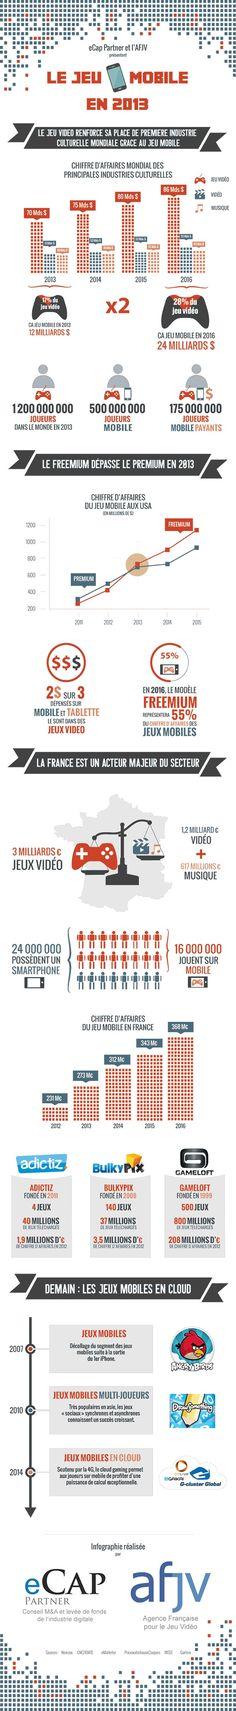 Video Gaming in France and worldwide for 2013 & prospectives regarding VG business models Mobiles, Web Mobile, Mobile Business, Video Game Industry, Marketing Data, Data Visualization, France, Social Media, Technology